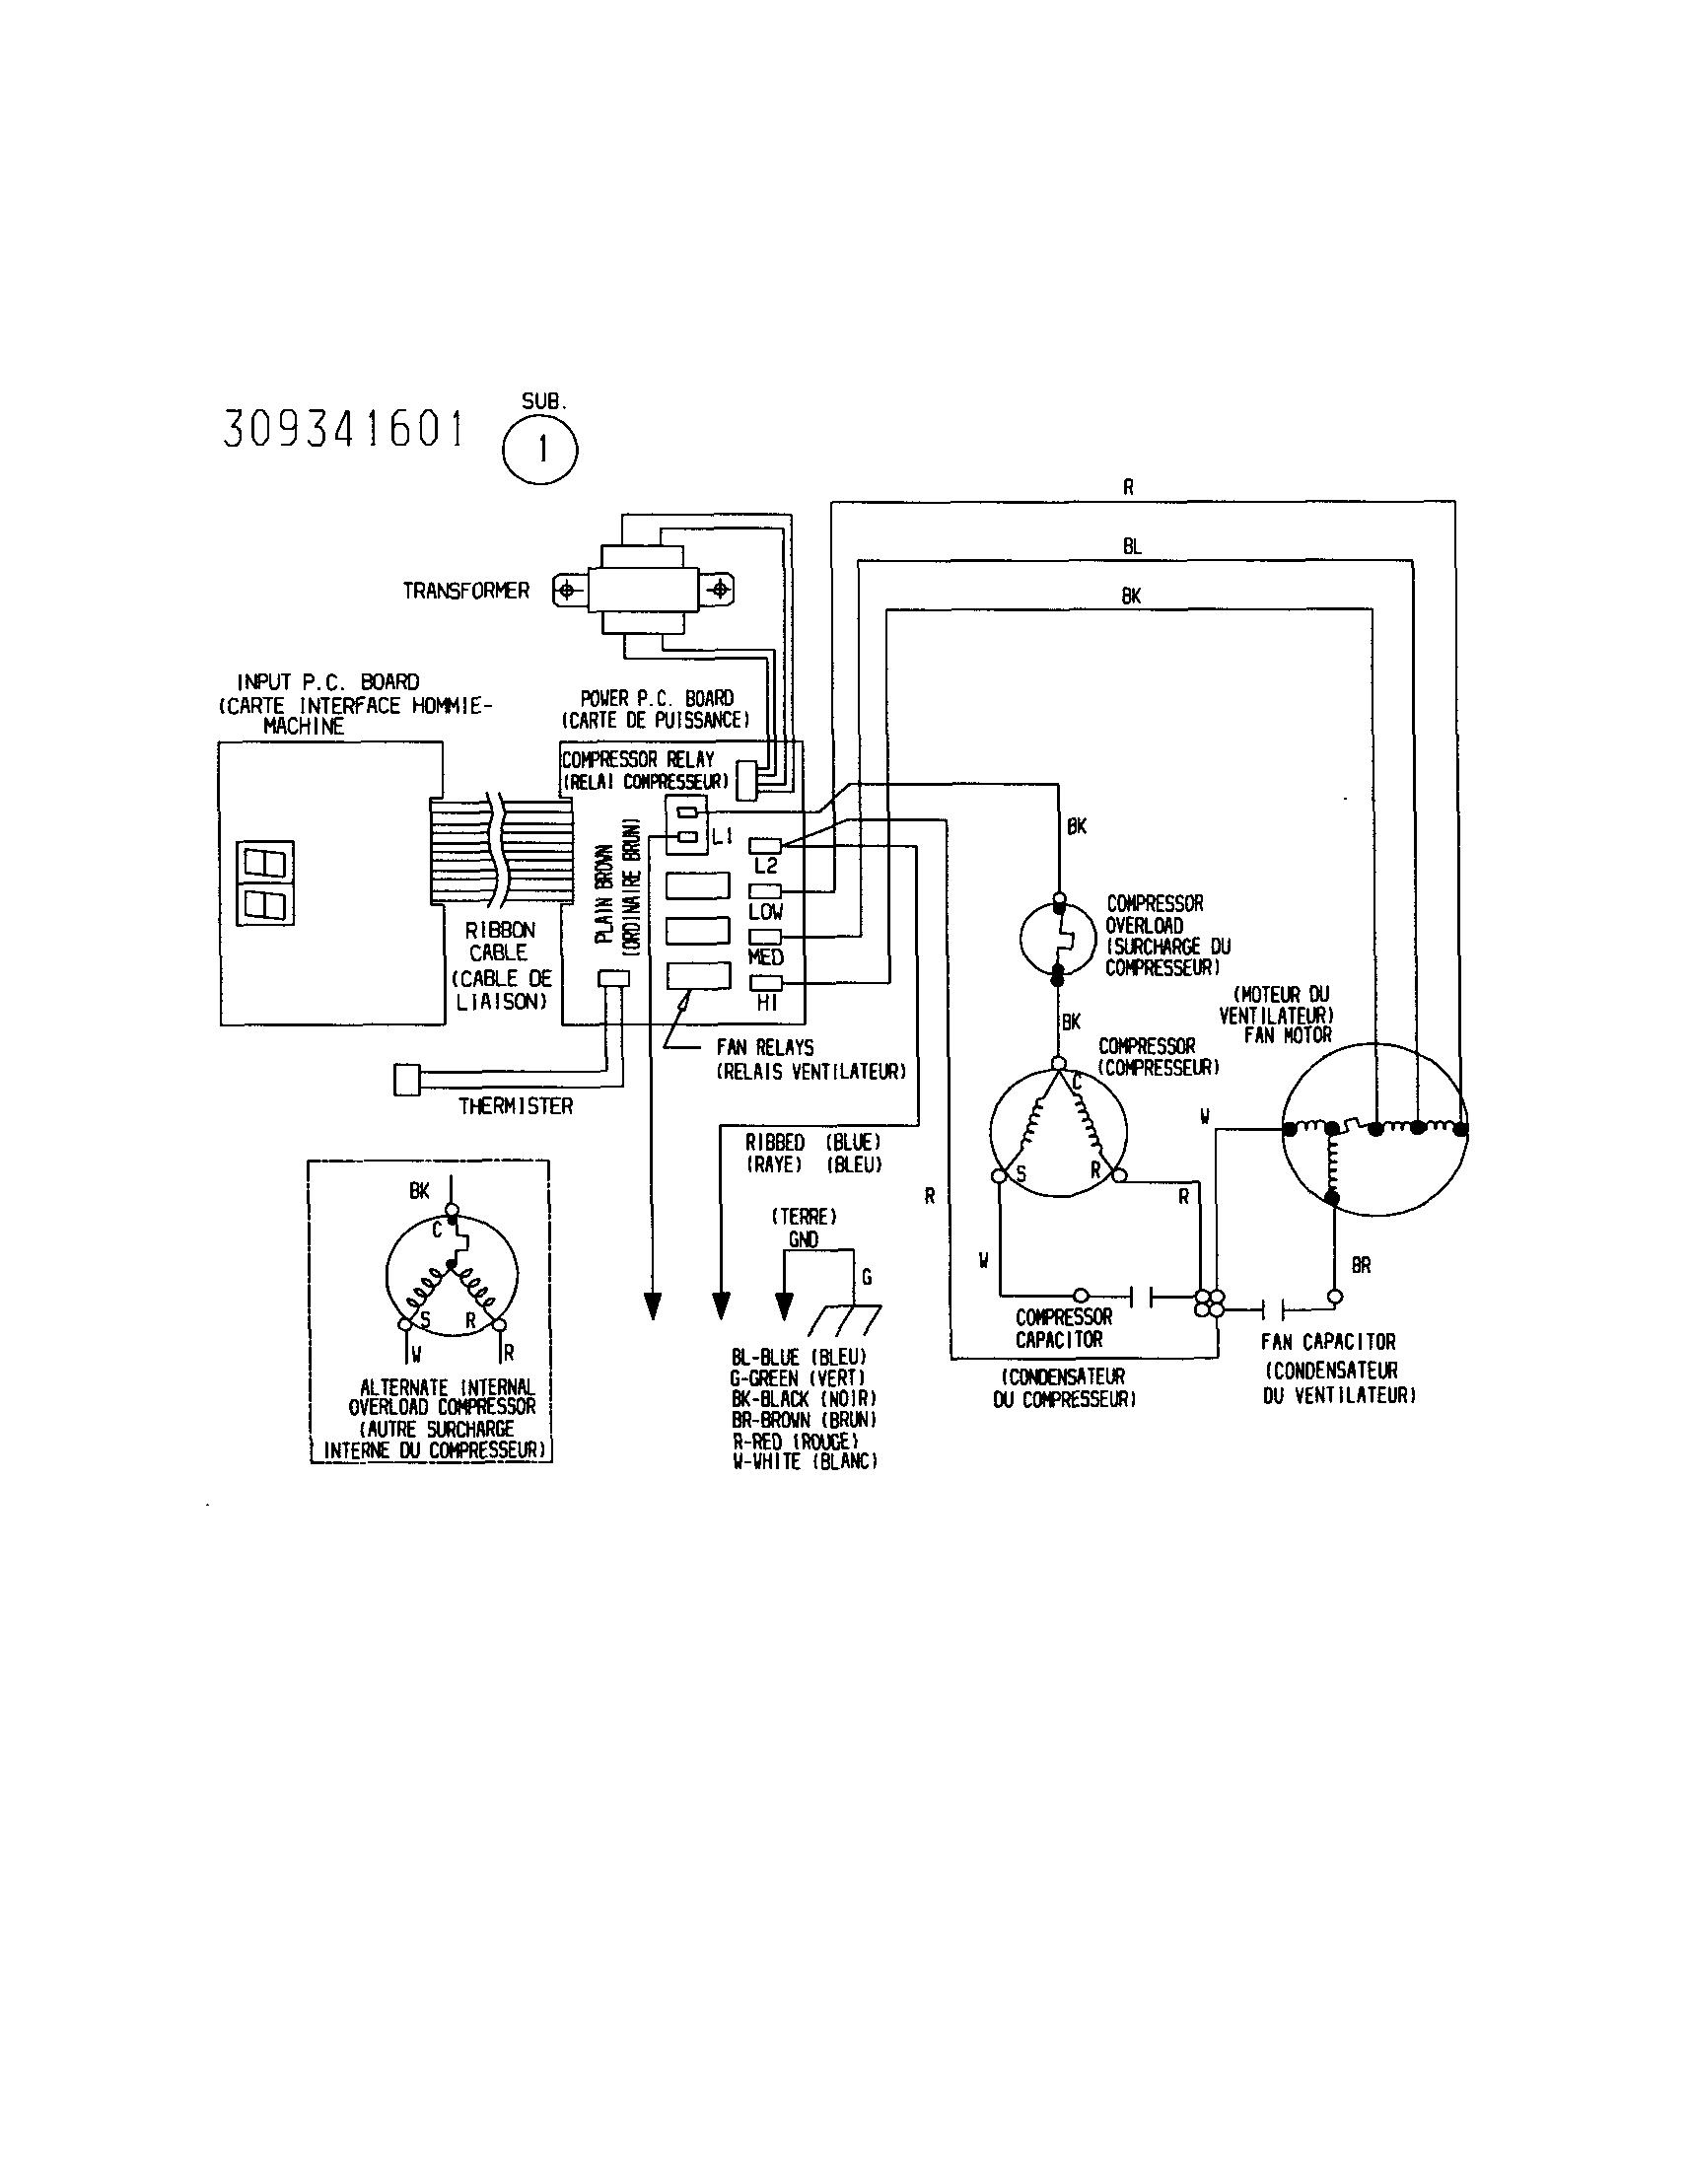 alternating rib relay wiring diagram free download schneider alternating relay wiring diagram Pump Alternating Relay Circuit